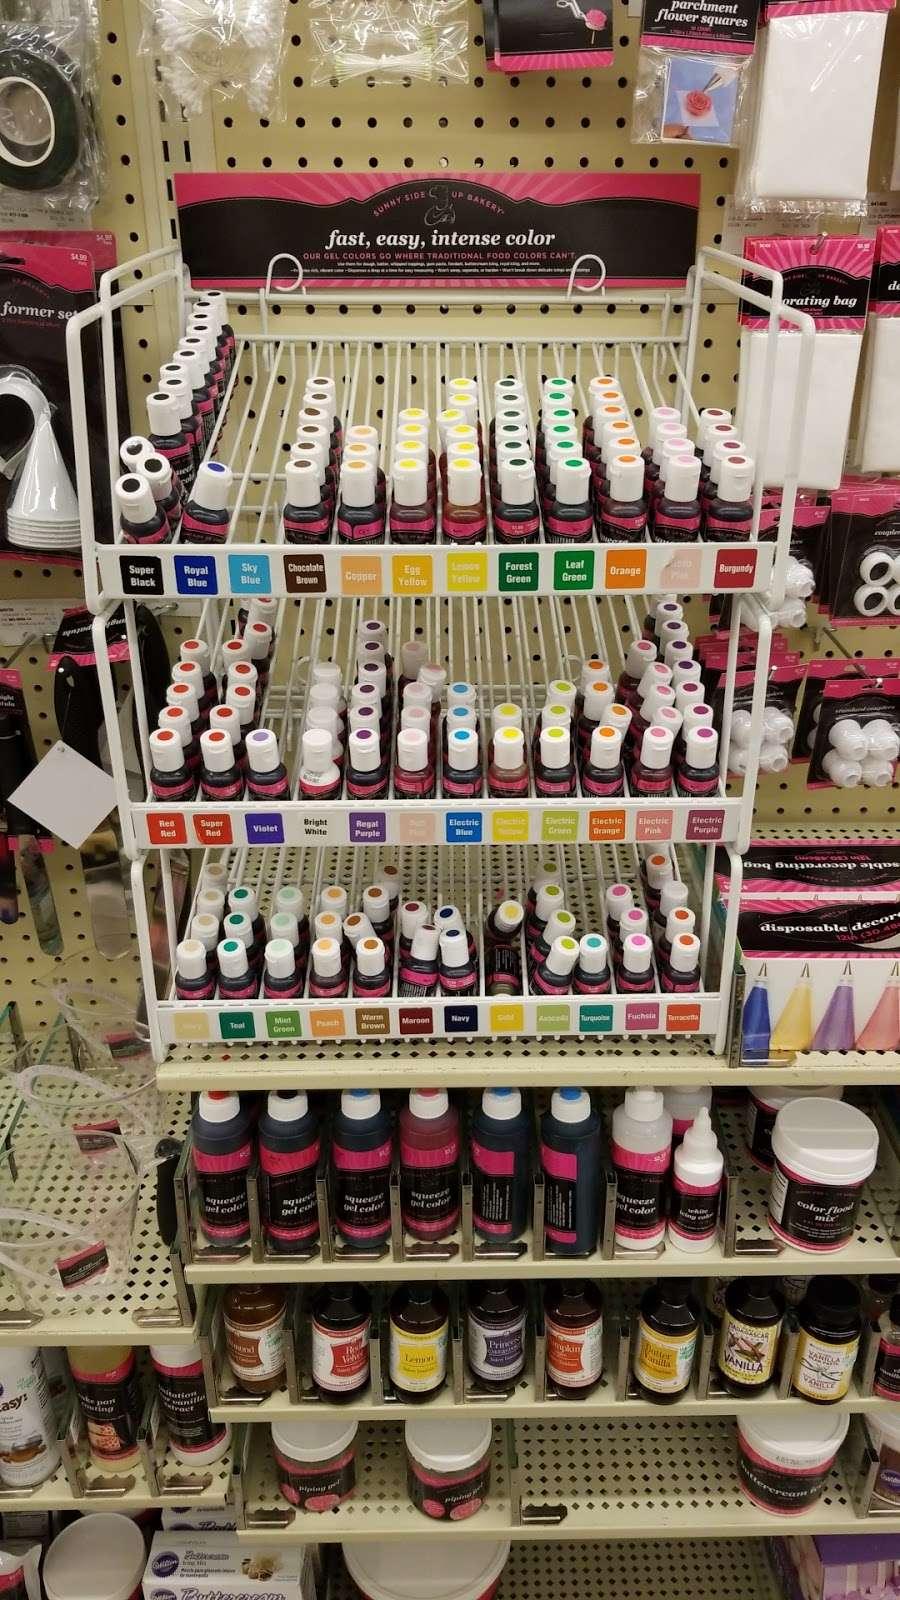 Hobby Lobby - home goods store  | Photo 10 of 10 | Address: 10575 E Washington St, Indianapolis, IN 46229, USA | Phone: (317) 897-1825